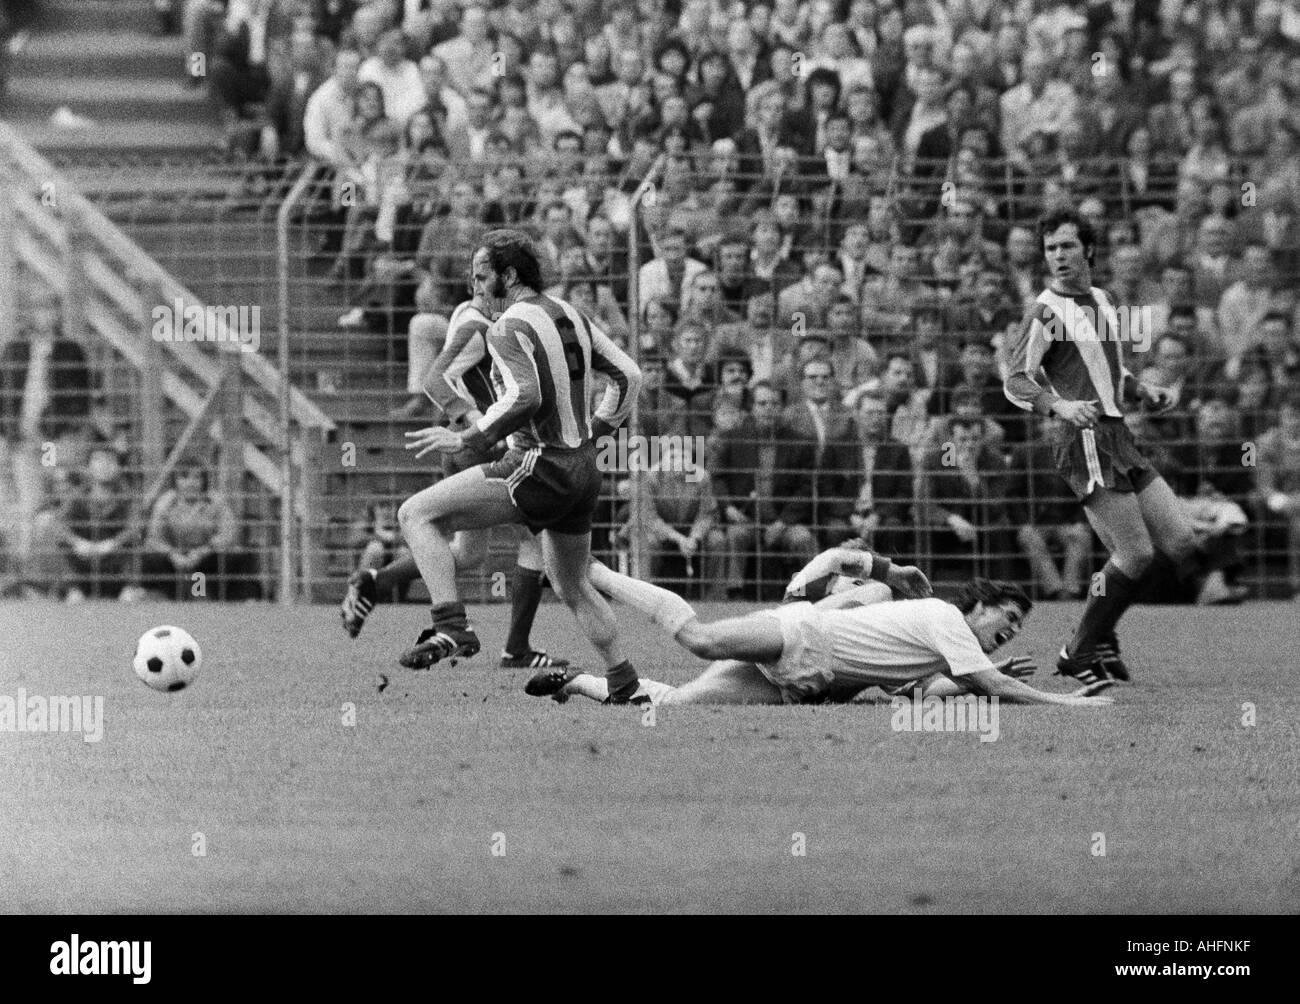 football, Bundesliga, 1971/1972, Stadium Radrennbahn near the Muengersdorfer Stadium in Cologne, 1. FC Cologne versus FC Bayern Munich 1:4, scene of the match, f.l.t.r. Franz Roth (FCB), Juergen Glowacz (Koeln) aground, Franz Beckenbauer (FCB) - Stock Image